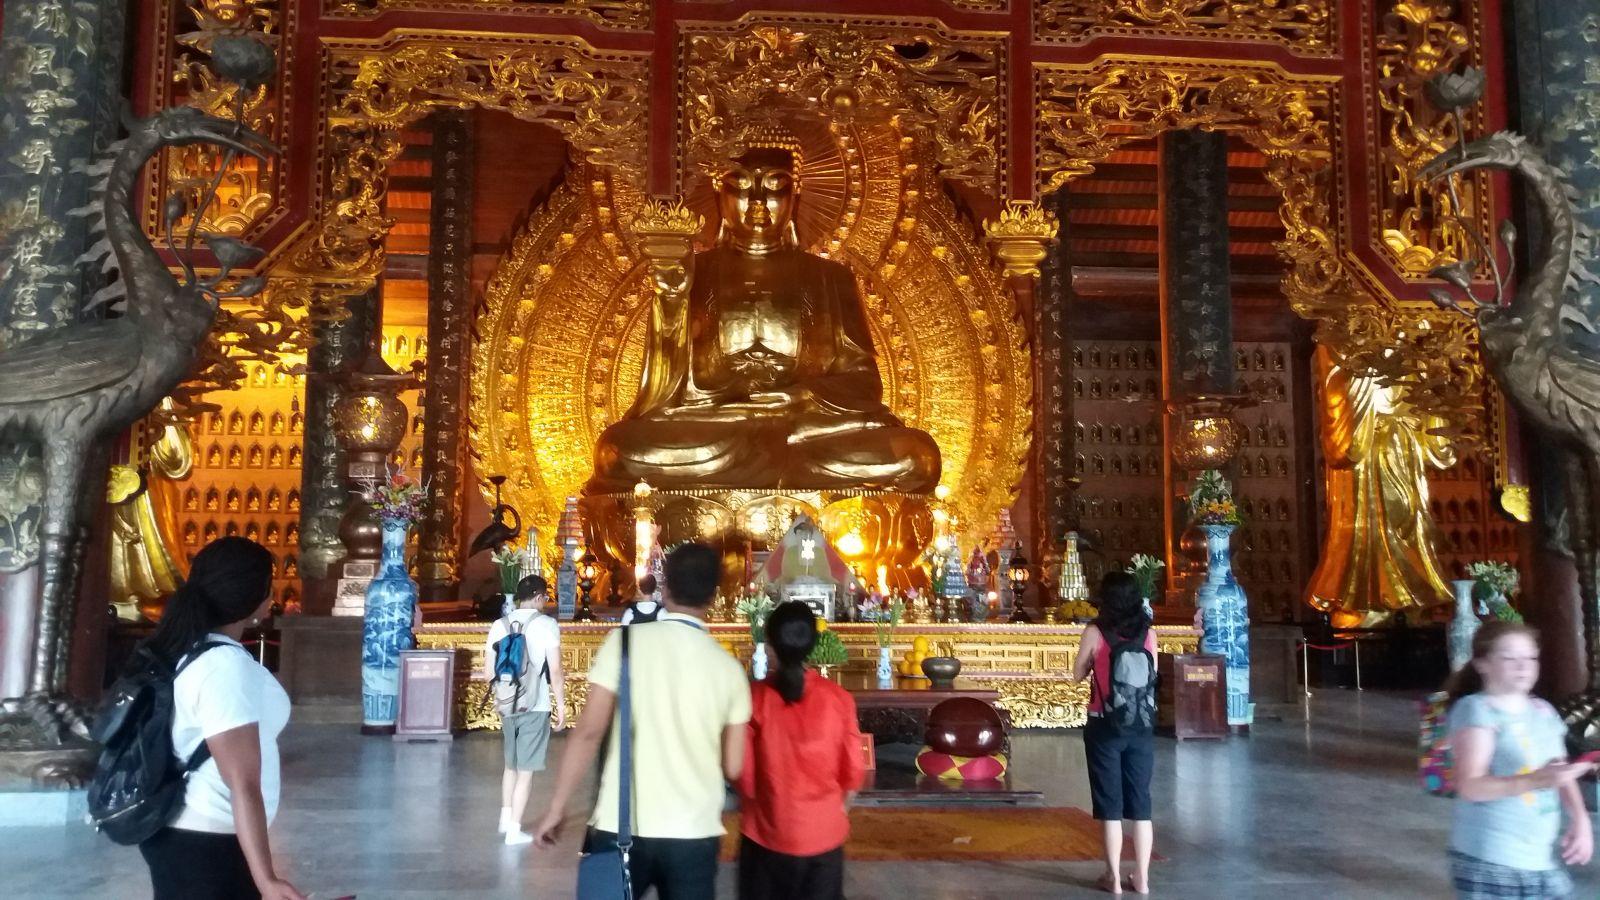 Bai Dinh Pagoda - the Buddha Statute